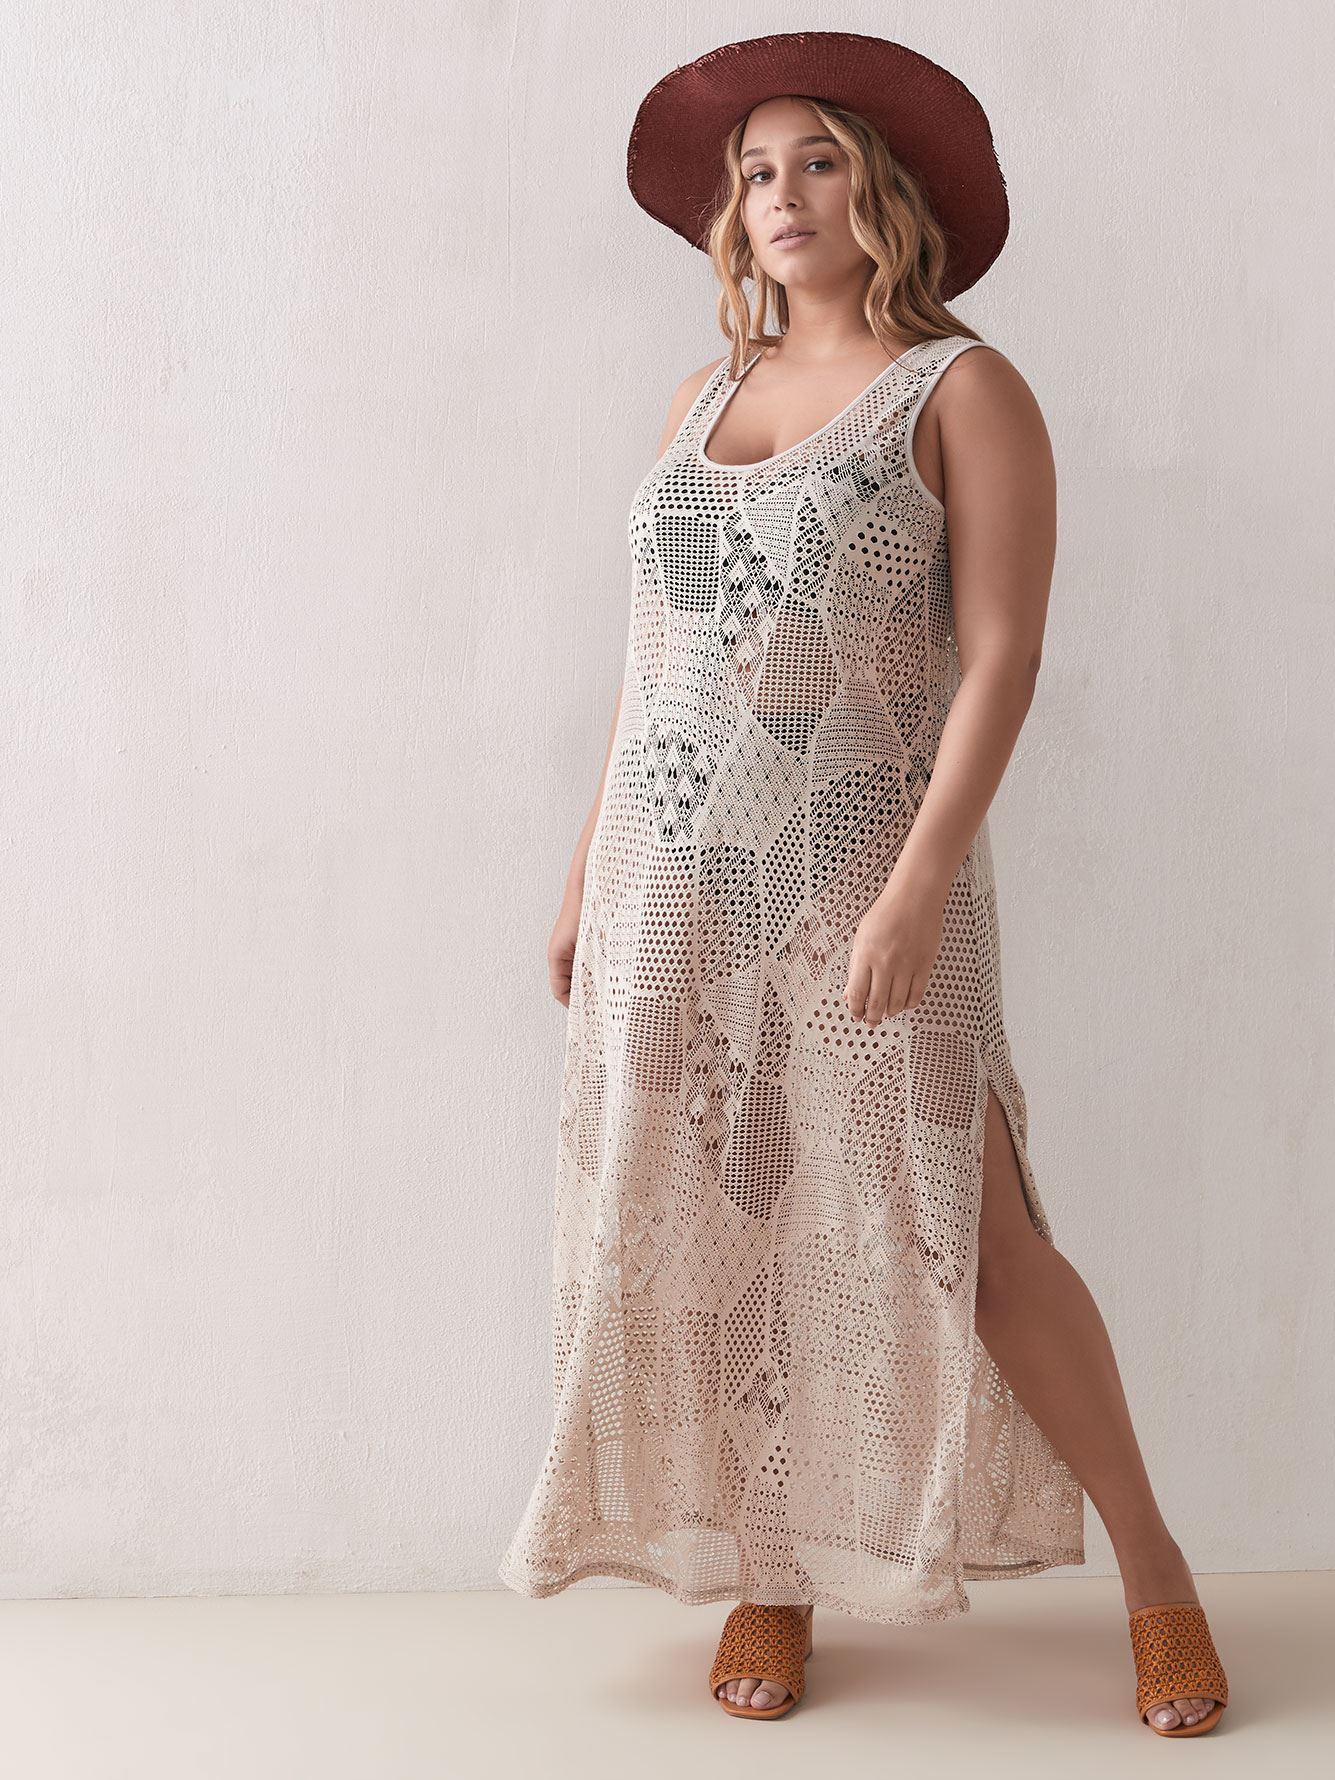 Sandy Bay Crochet Maxi Dress - Cover Me 4